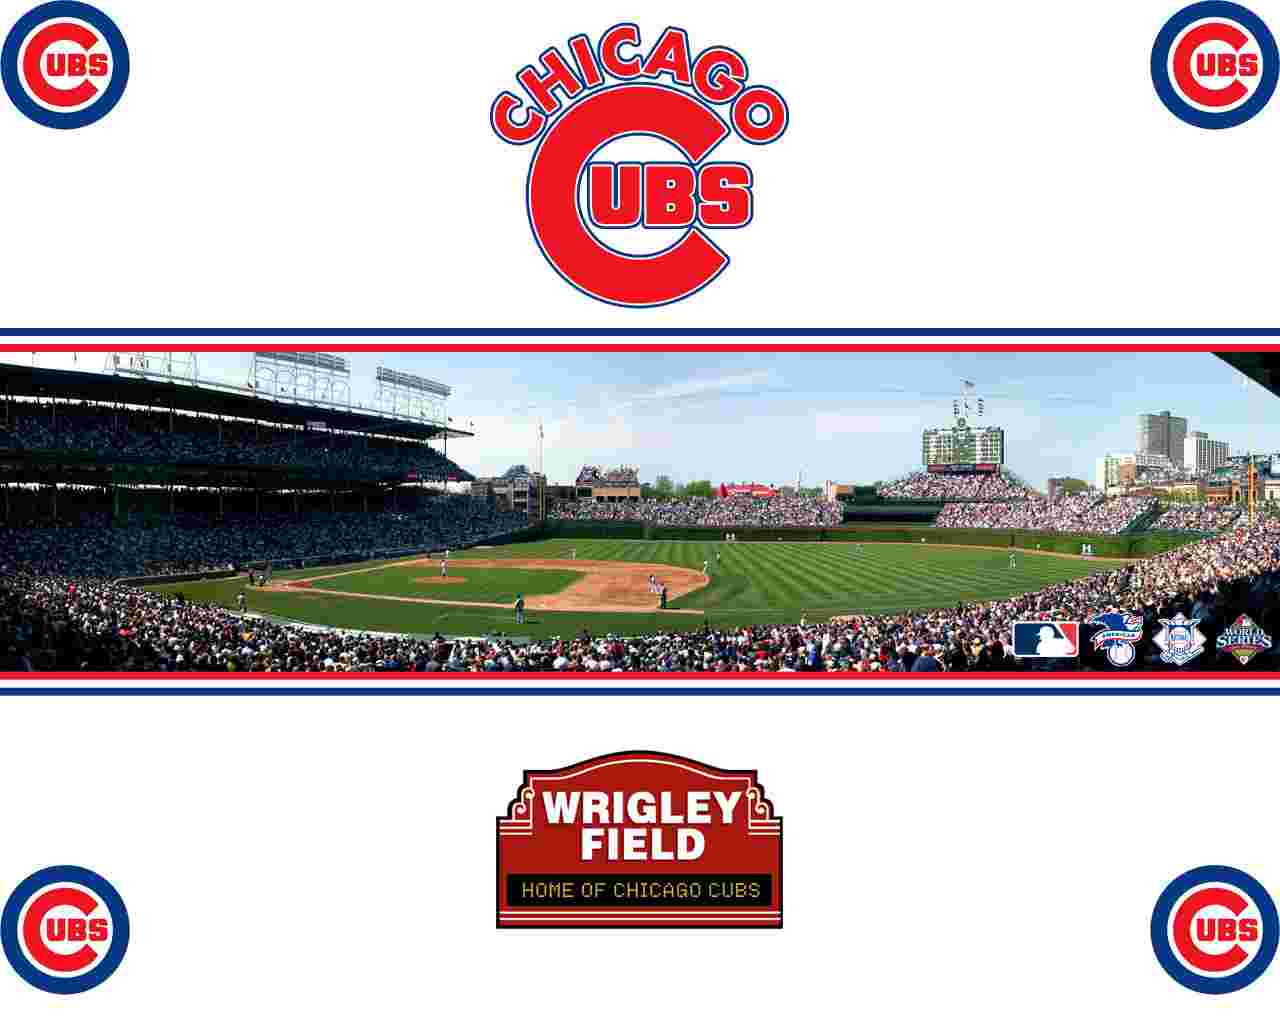 chicago cubs wallpaper   Baseball   Sport   Wallpaper Collection 1280x1024